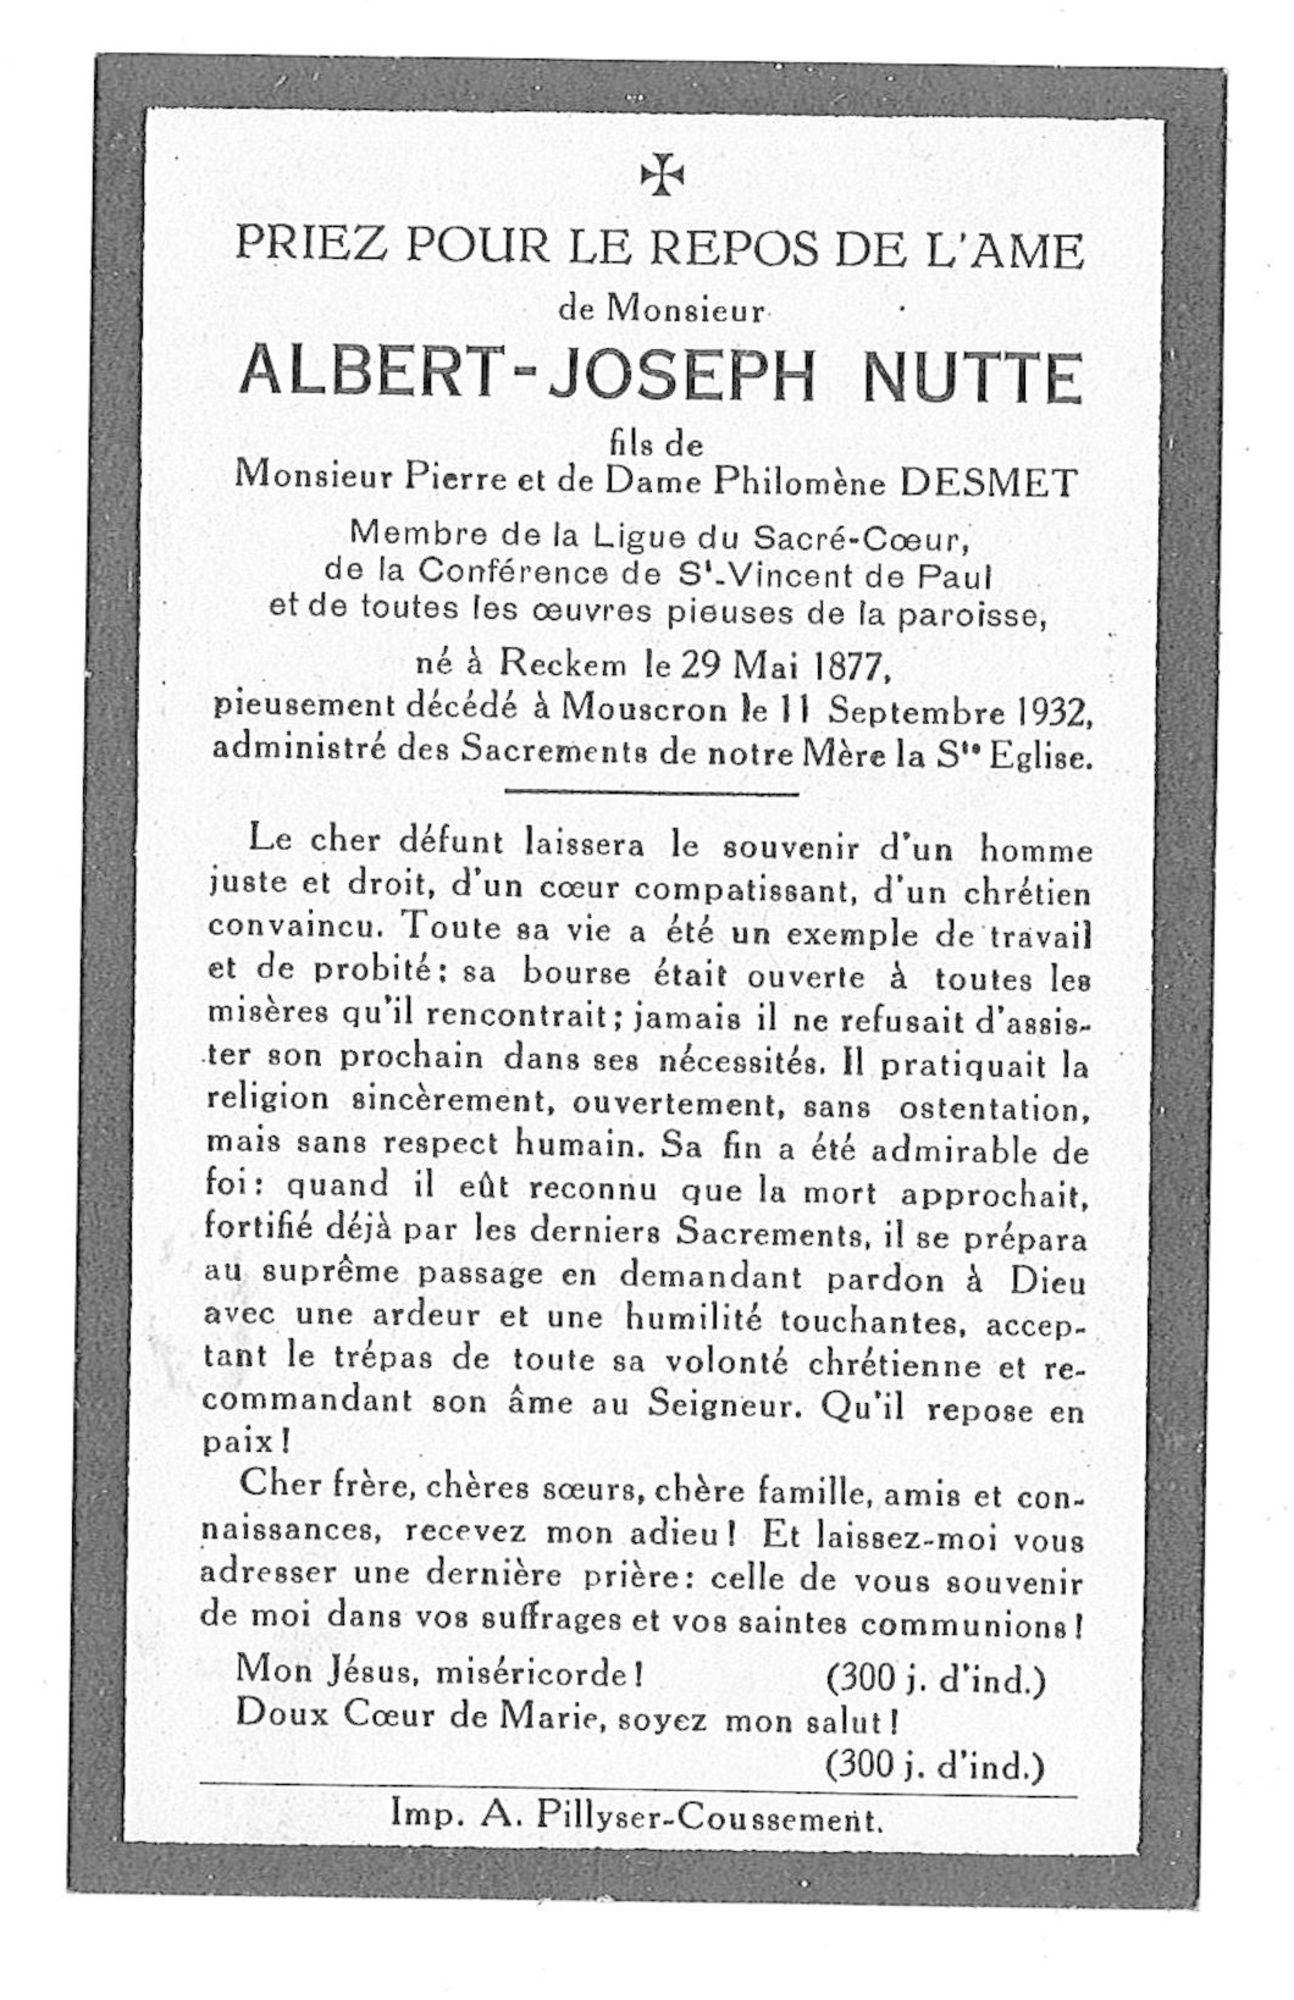 Albert-Joseph Nutte